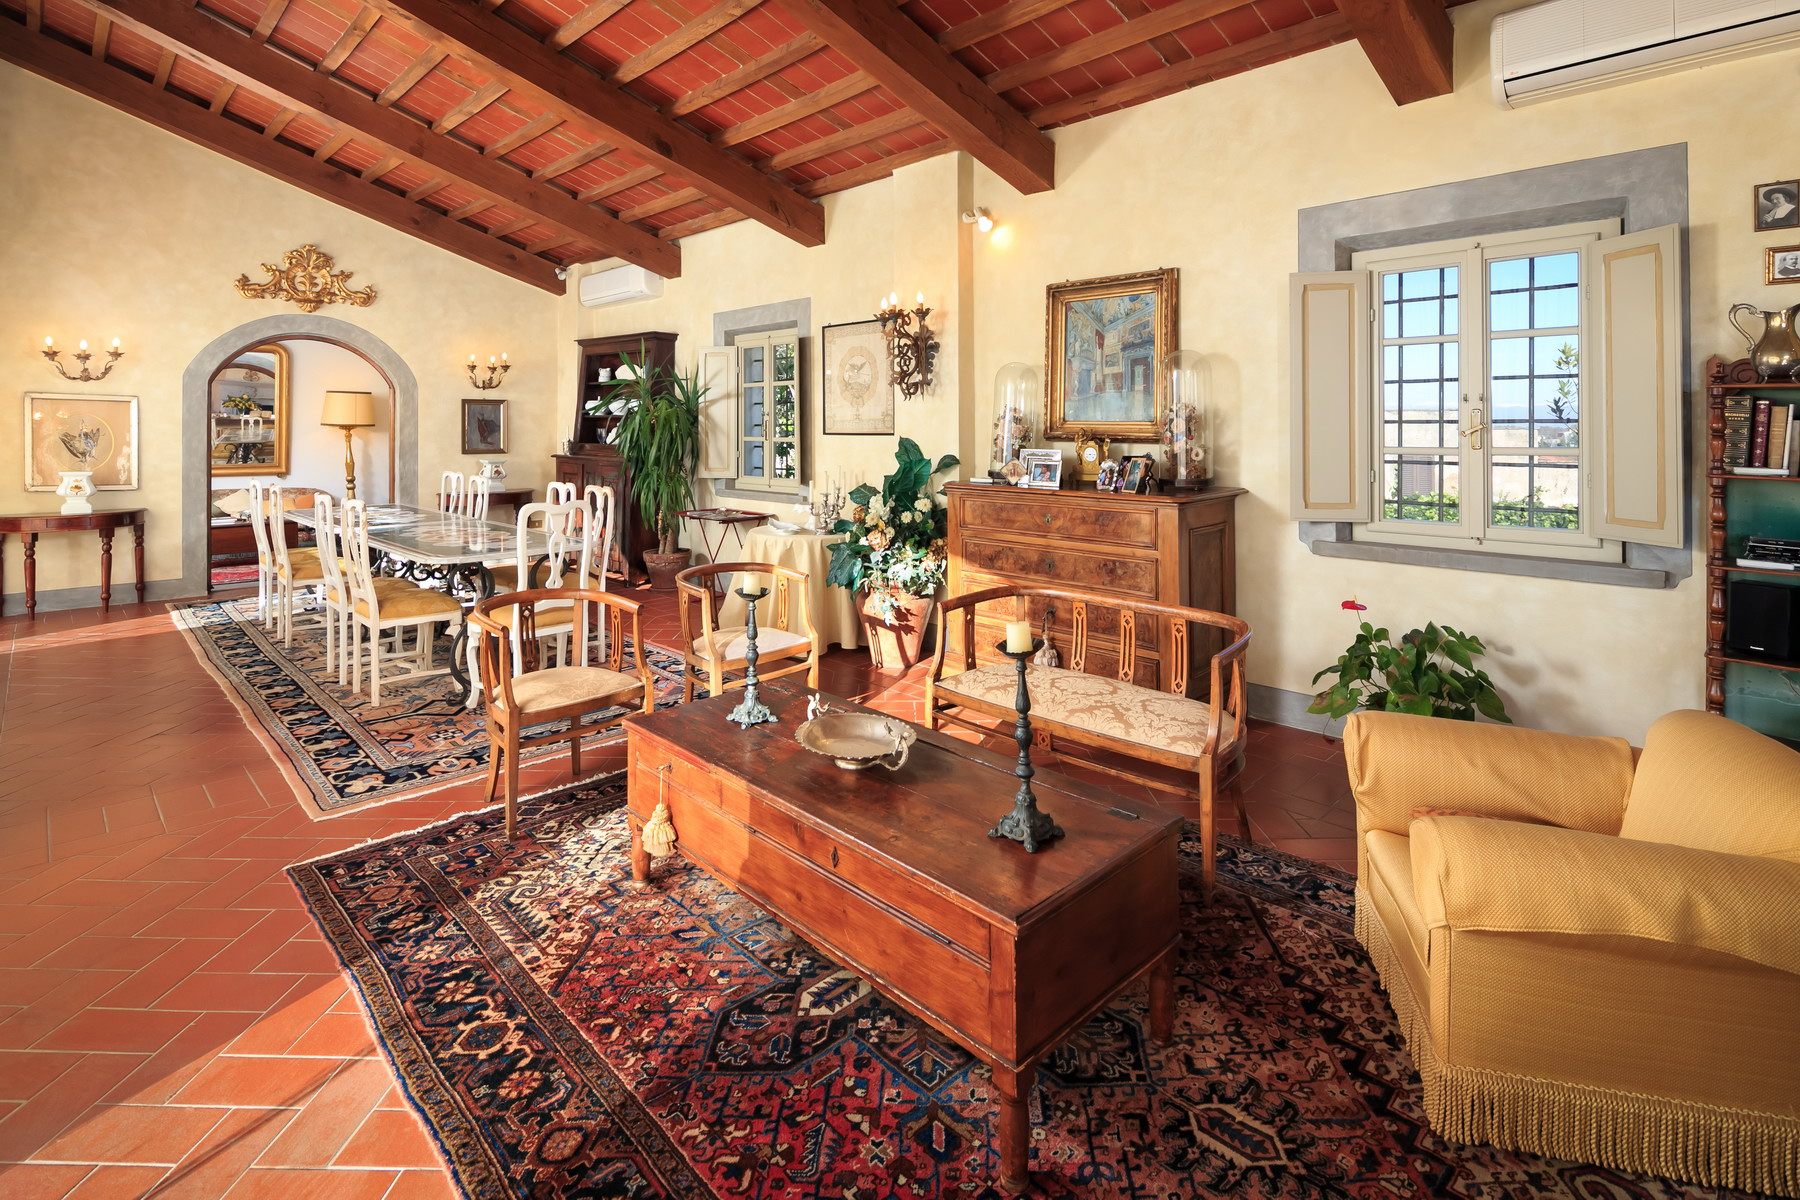 Villa in Vendita a Casciana Terme Lari: 5 locali, 550 mq - Foto 2